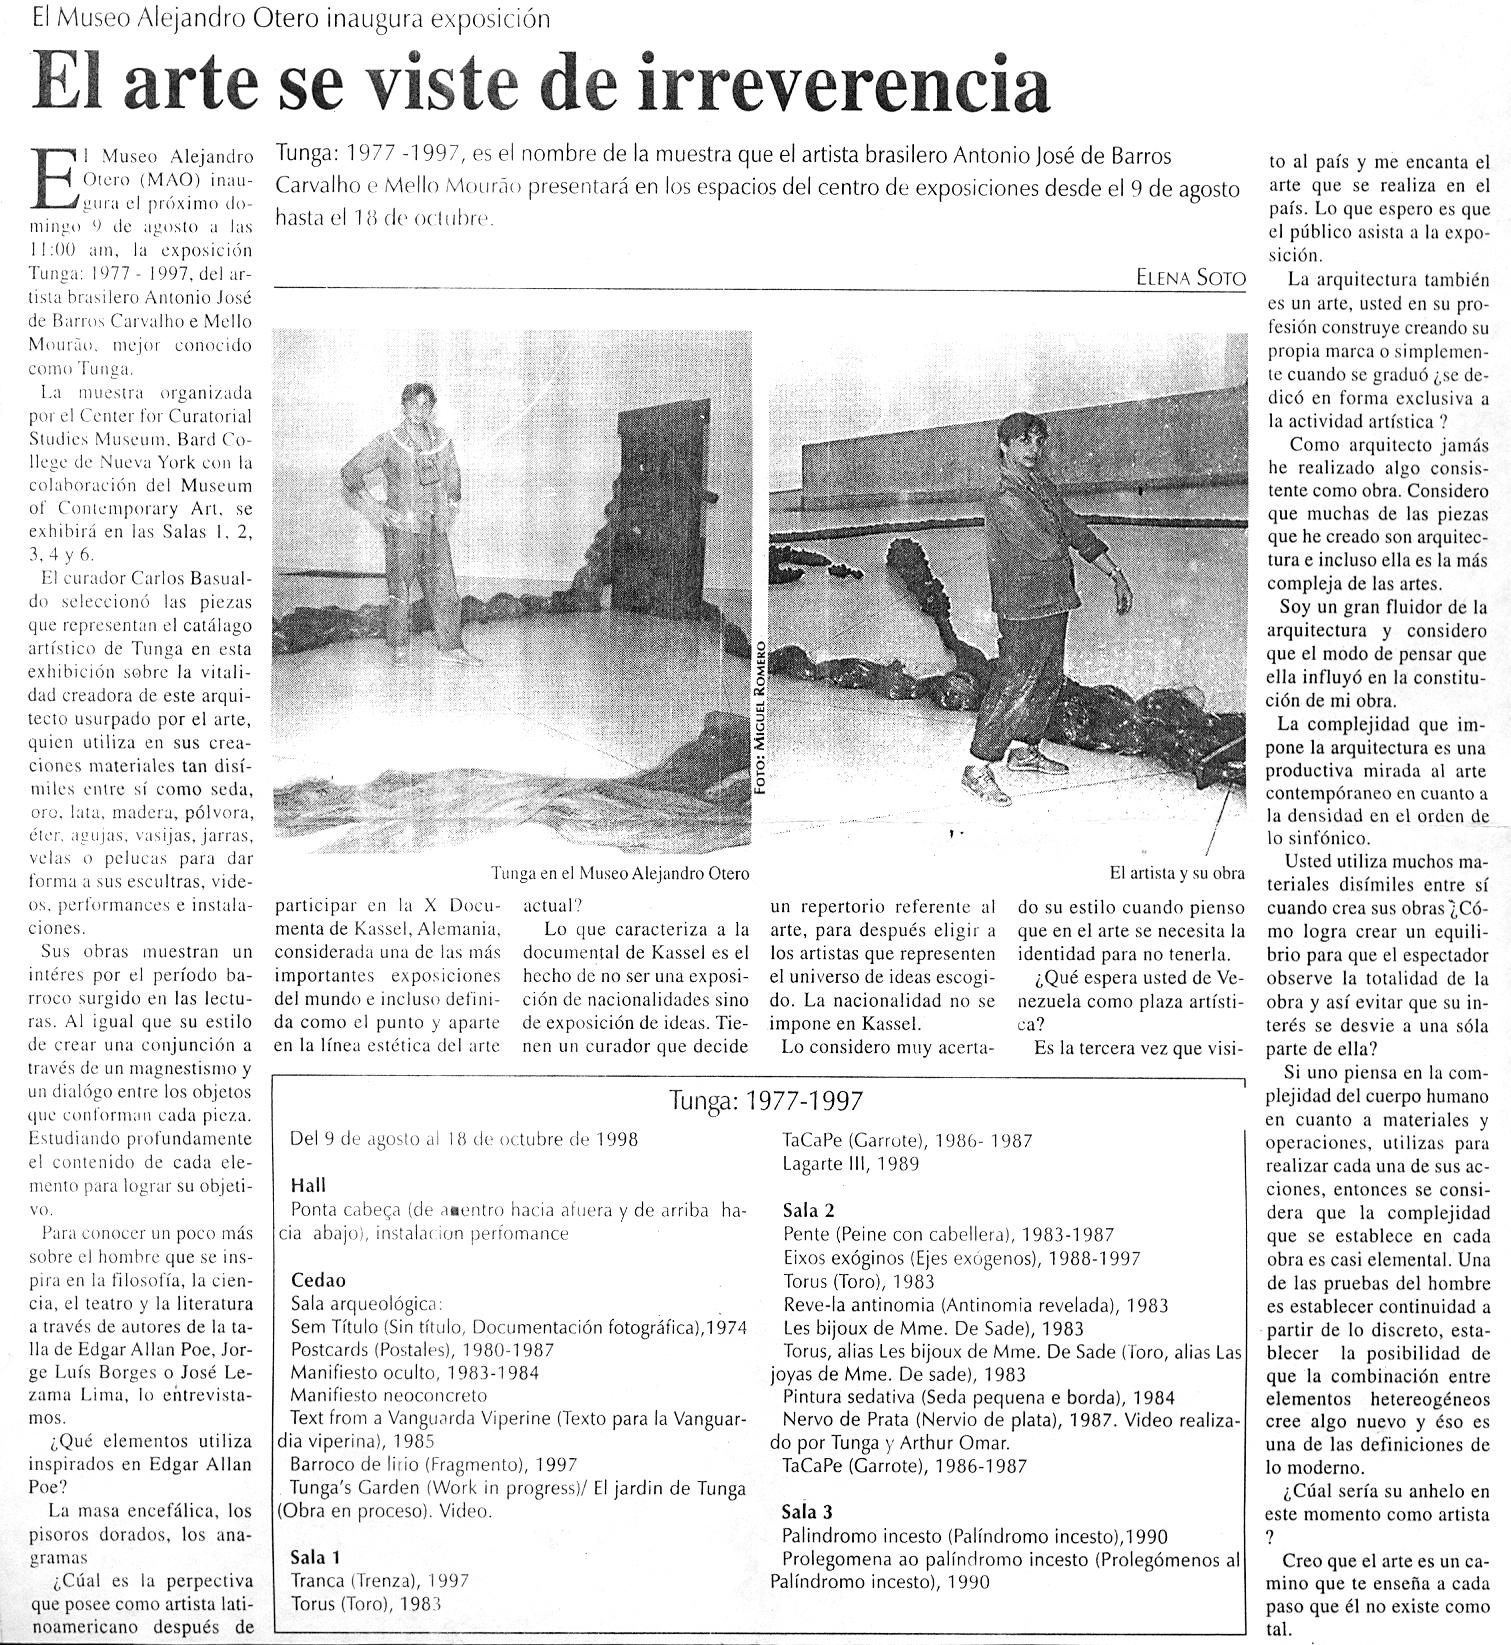 20 years Survey 1977 – 1997 – Museo Alejandro Otero – Caracas – Venezuela